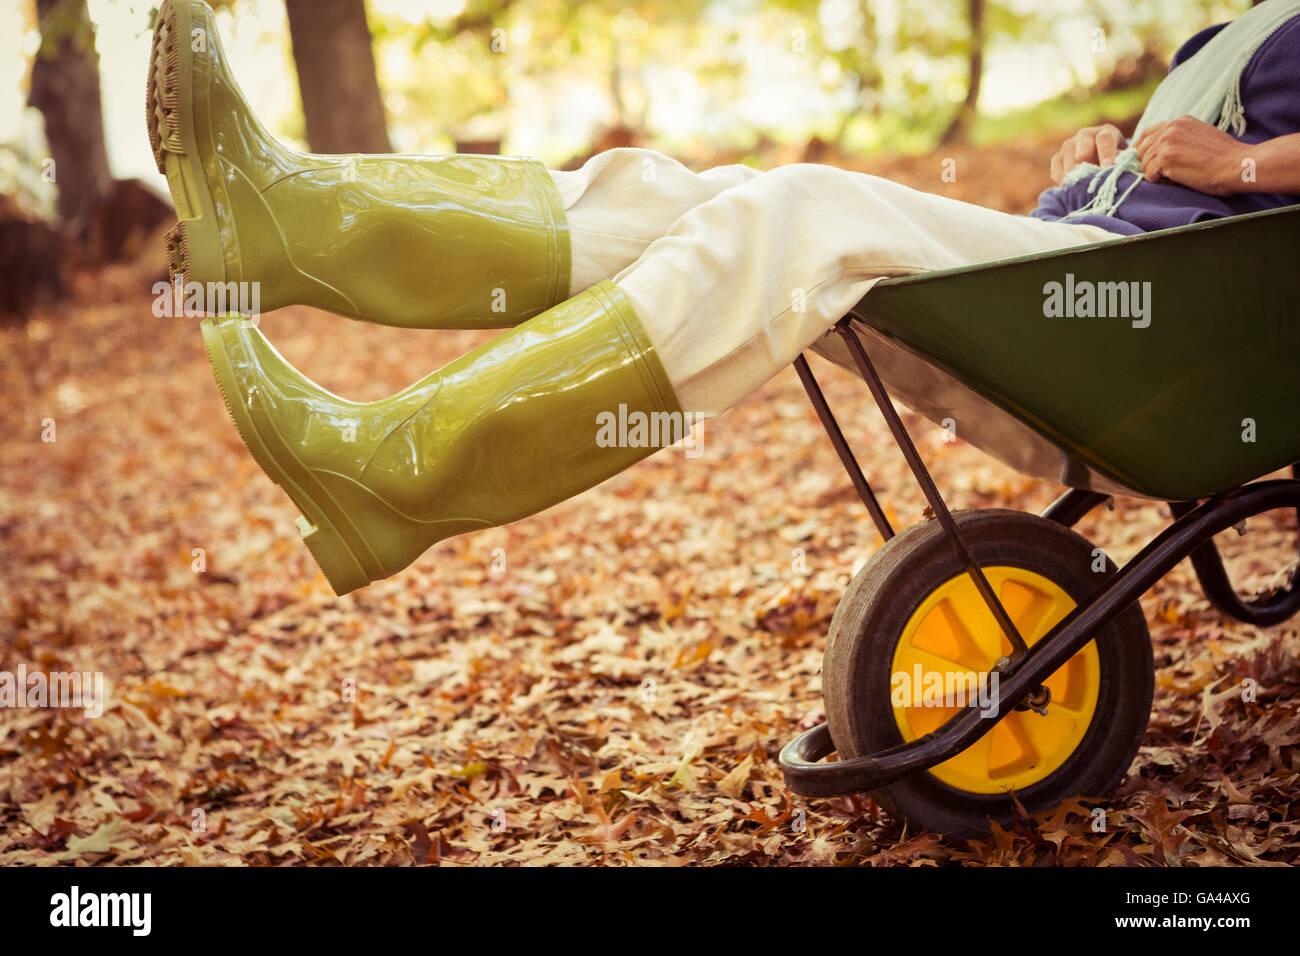 Low section of gardener sitting in wheelbarrow at garden Stock Photo